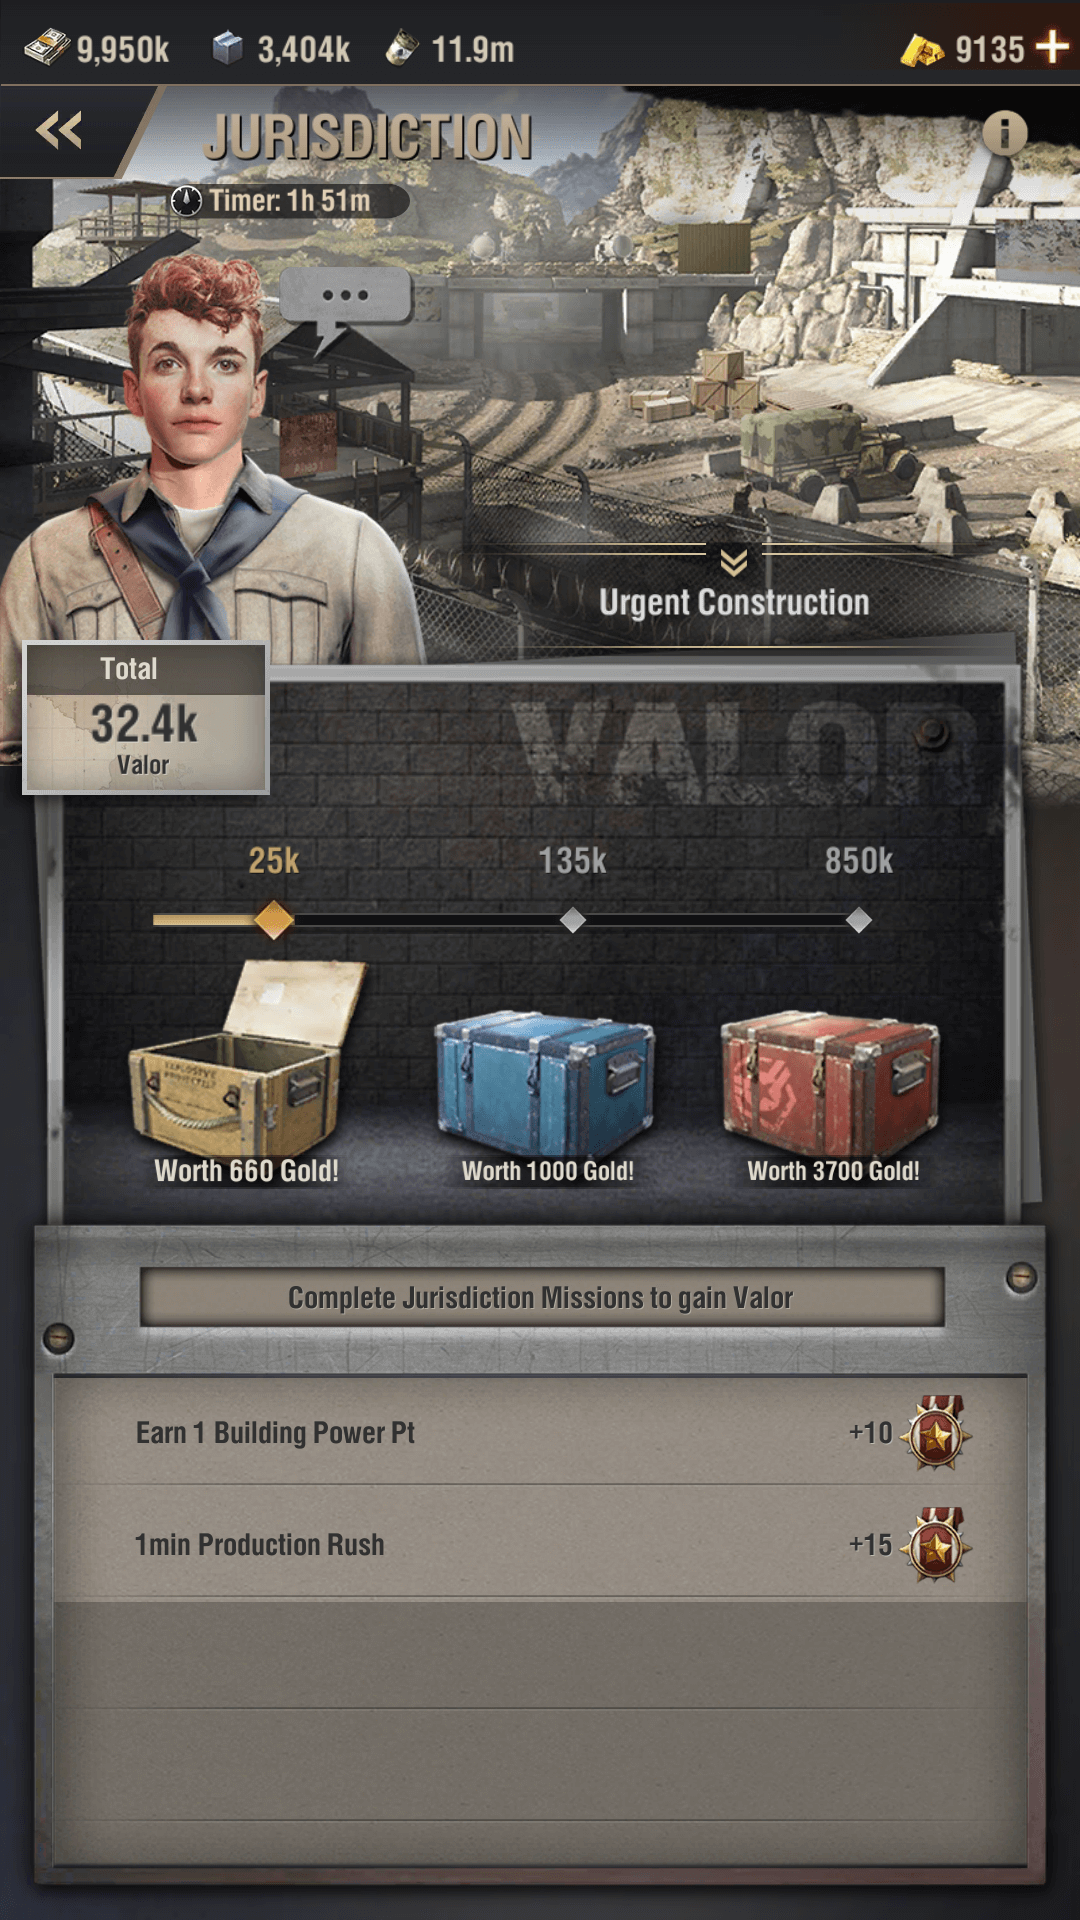 event Jurisdiction warpath screenshot 3